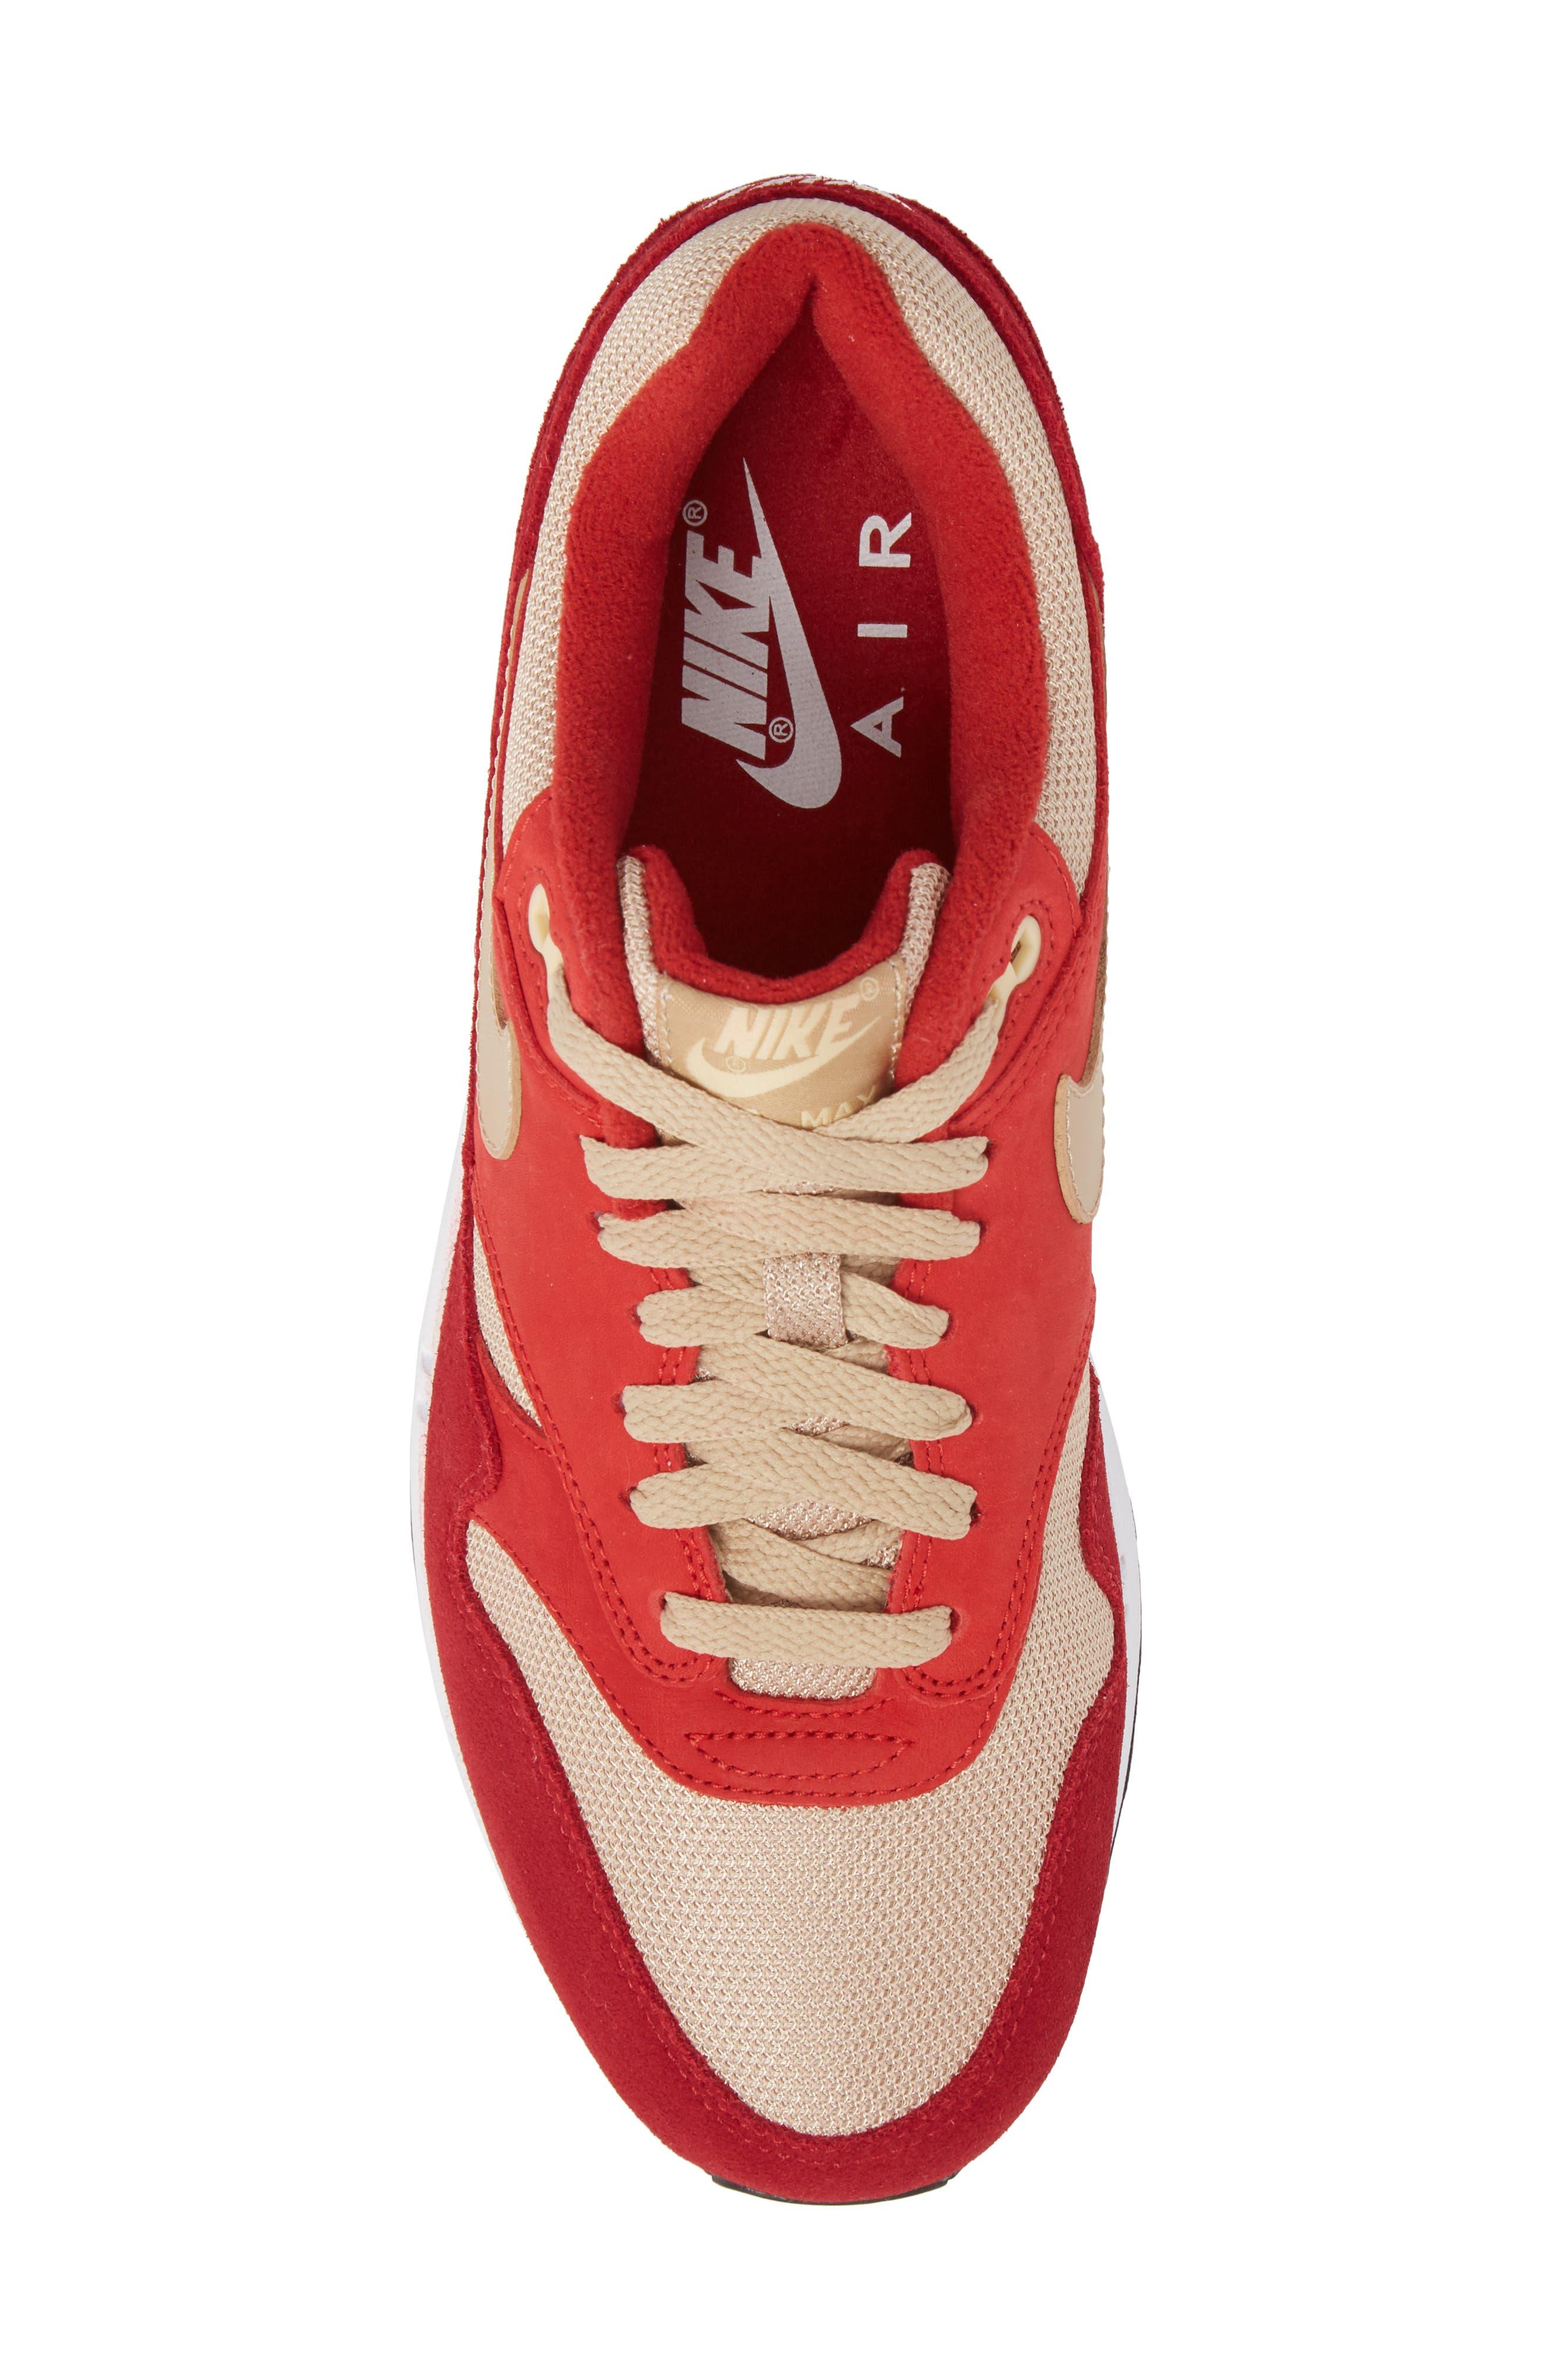 Air Max 1 Premium Retro Sneaker,                             Alternate thumbnail 5, color,                             Red/ Mushroom-Red-Vanilla